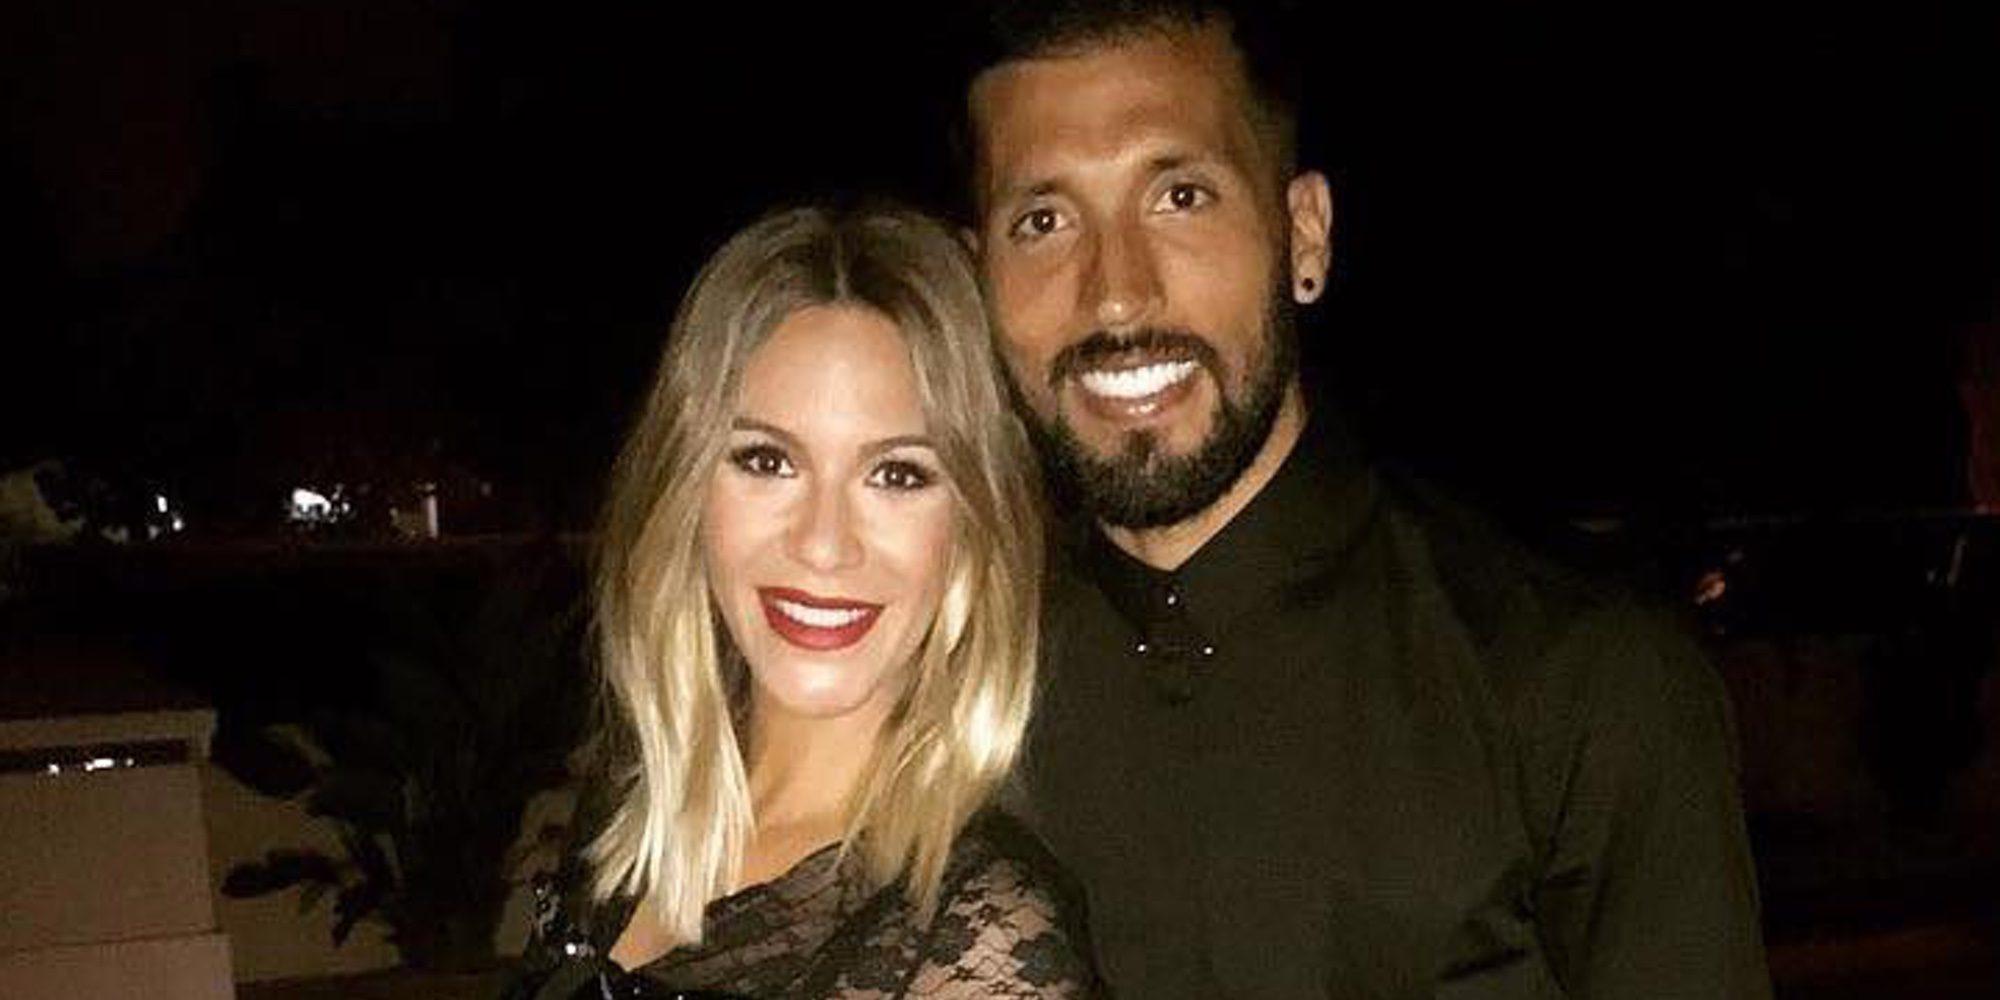 Tamara Gorro celebra el primer mes de vida de su hijo Antonio